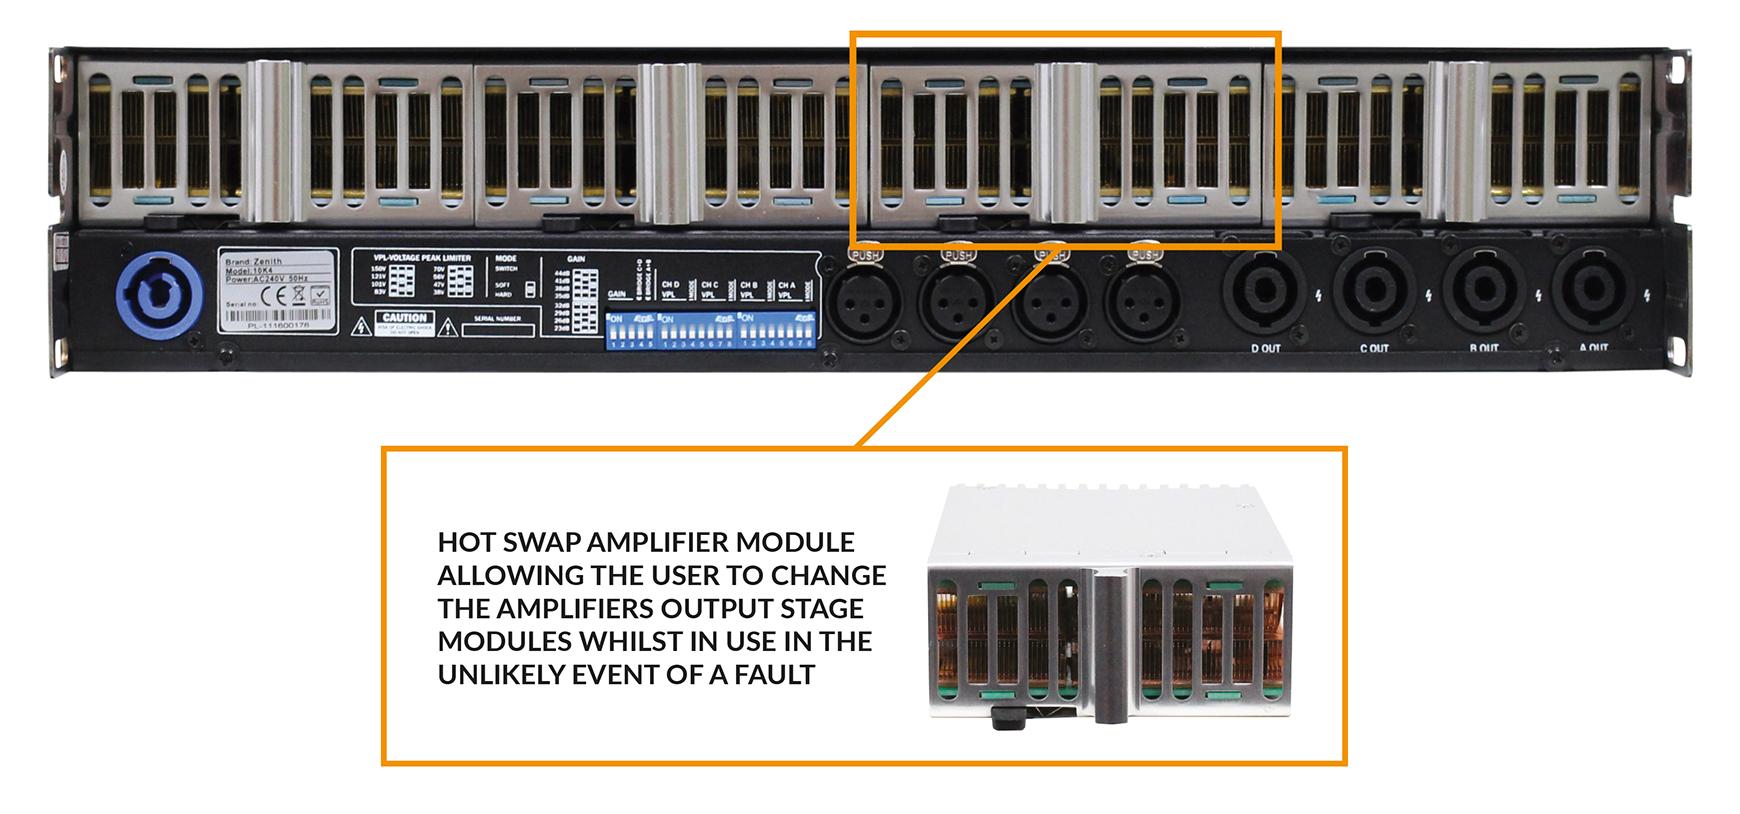 Zenith 10K4 Amplifiers at Alton Towers Resort